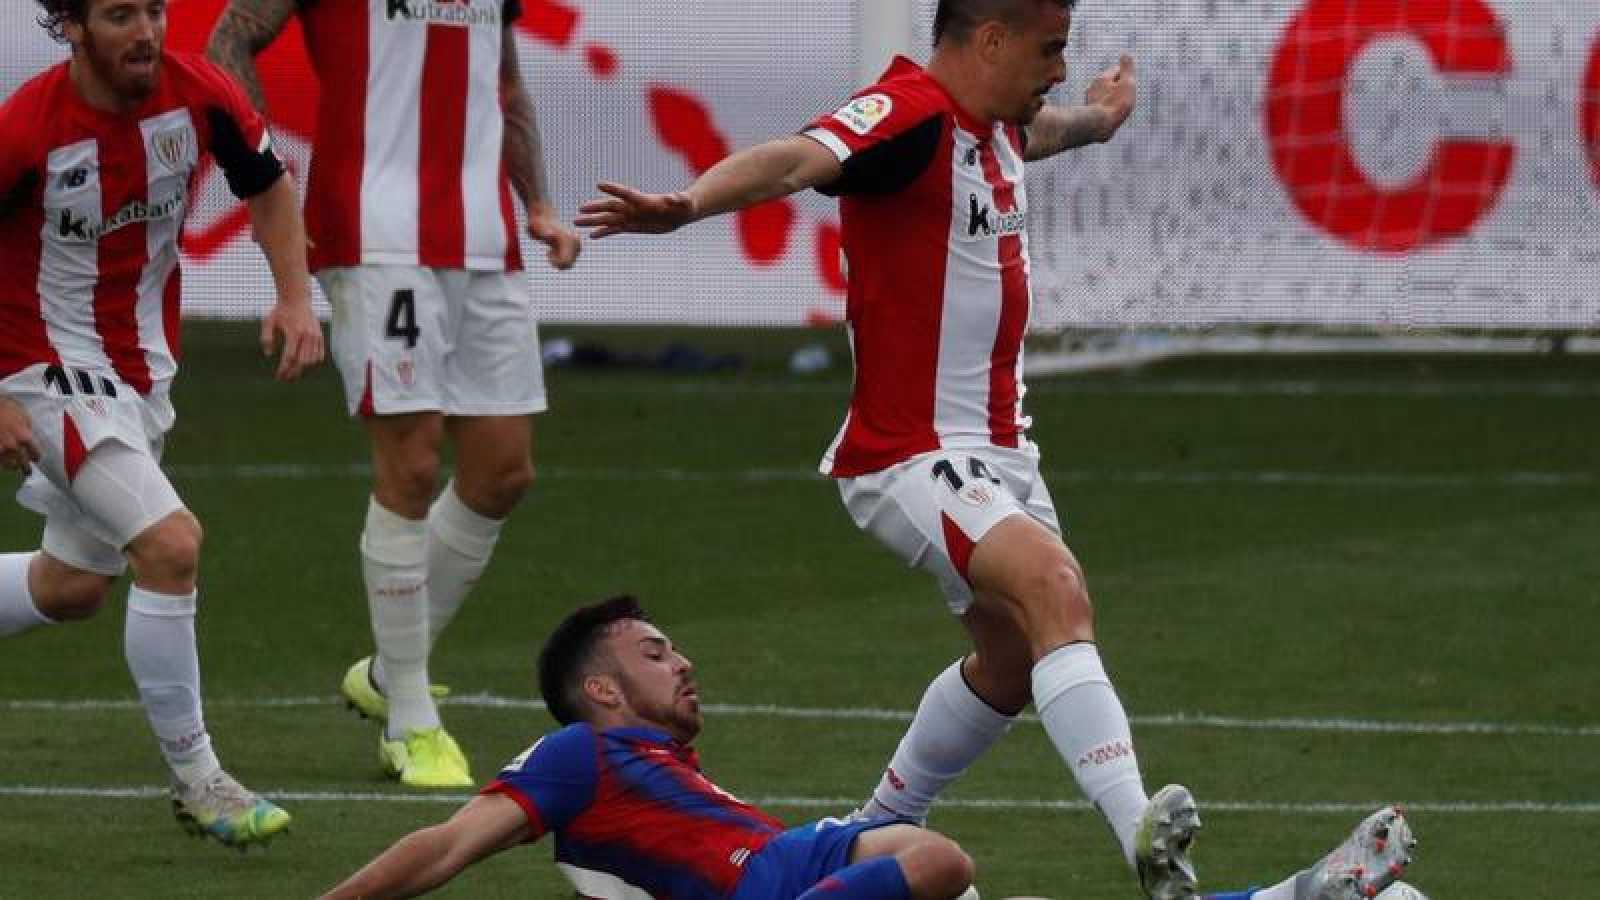 El defensa del Athletic Club, Ander Capa (d), disputa un balón ante Edu Expósito.